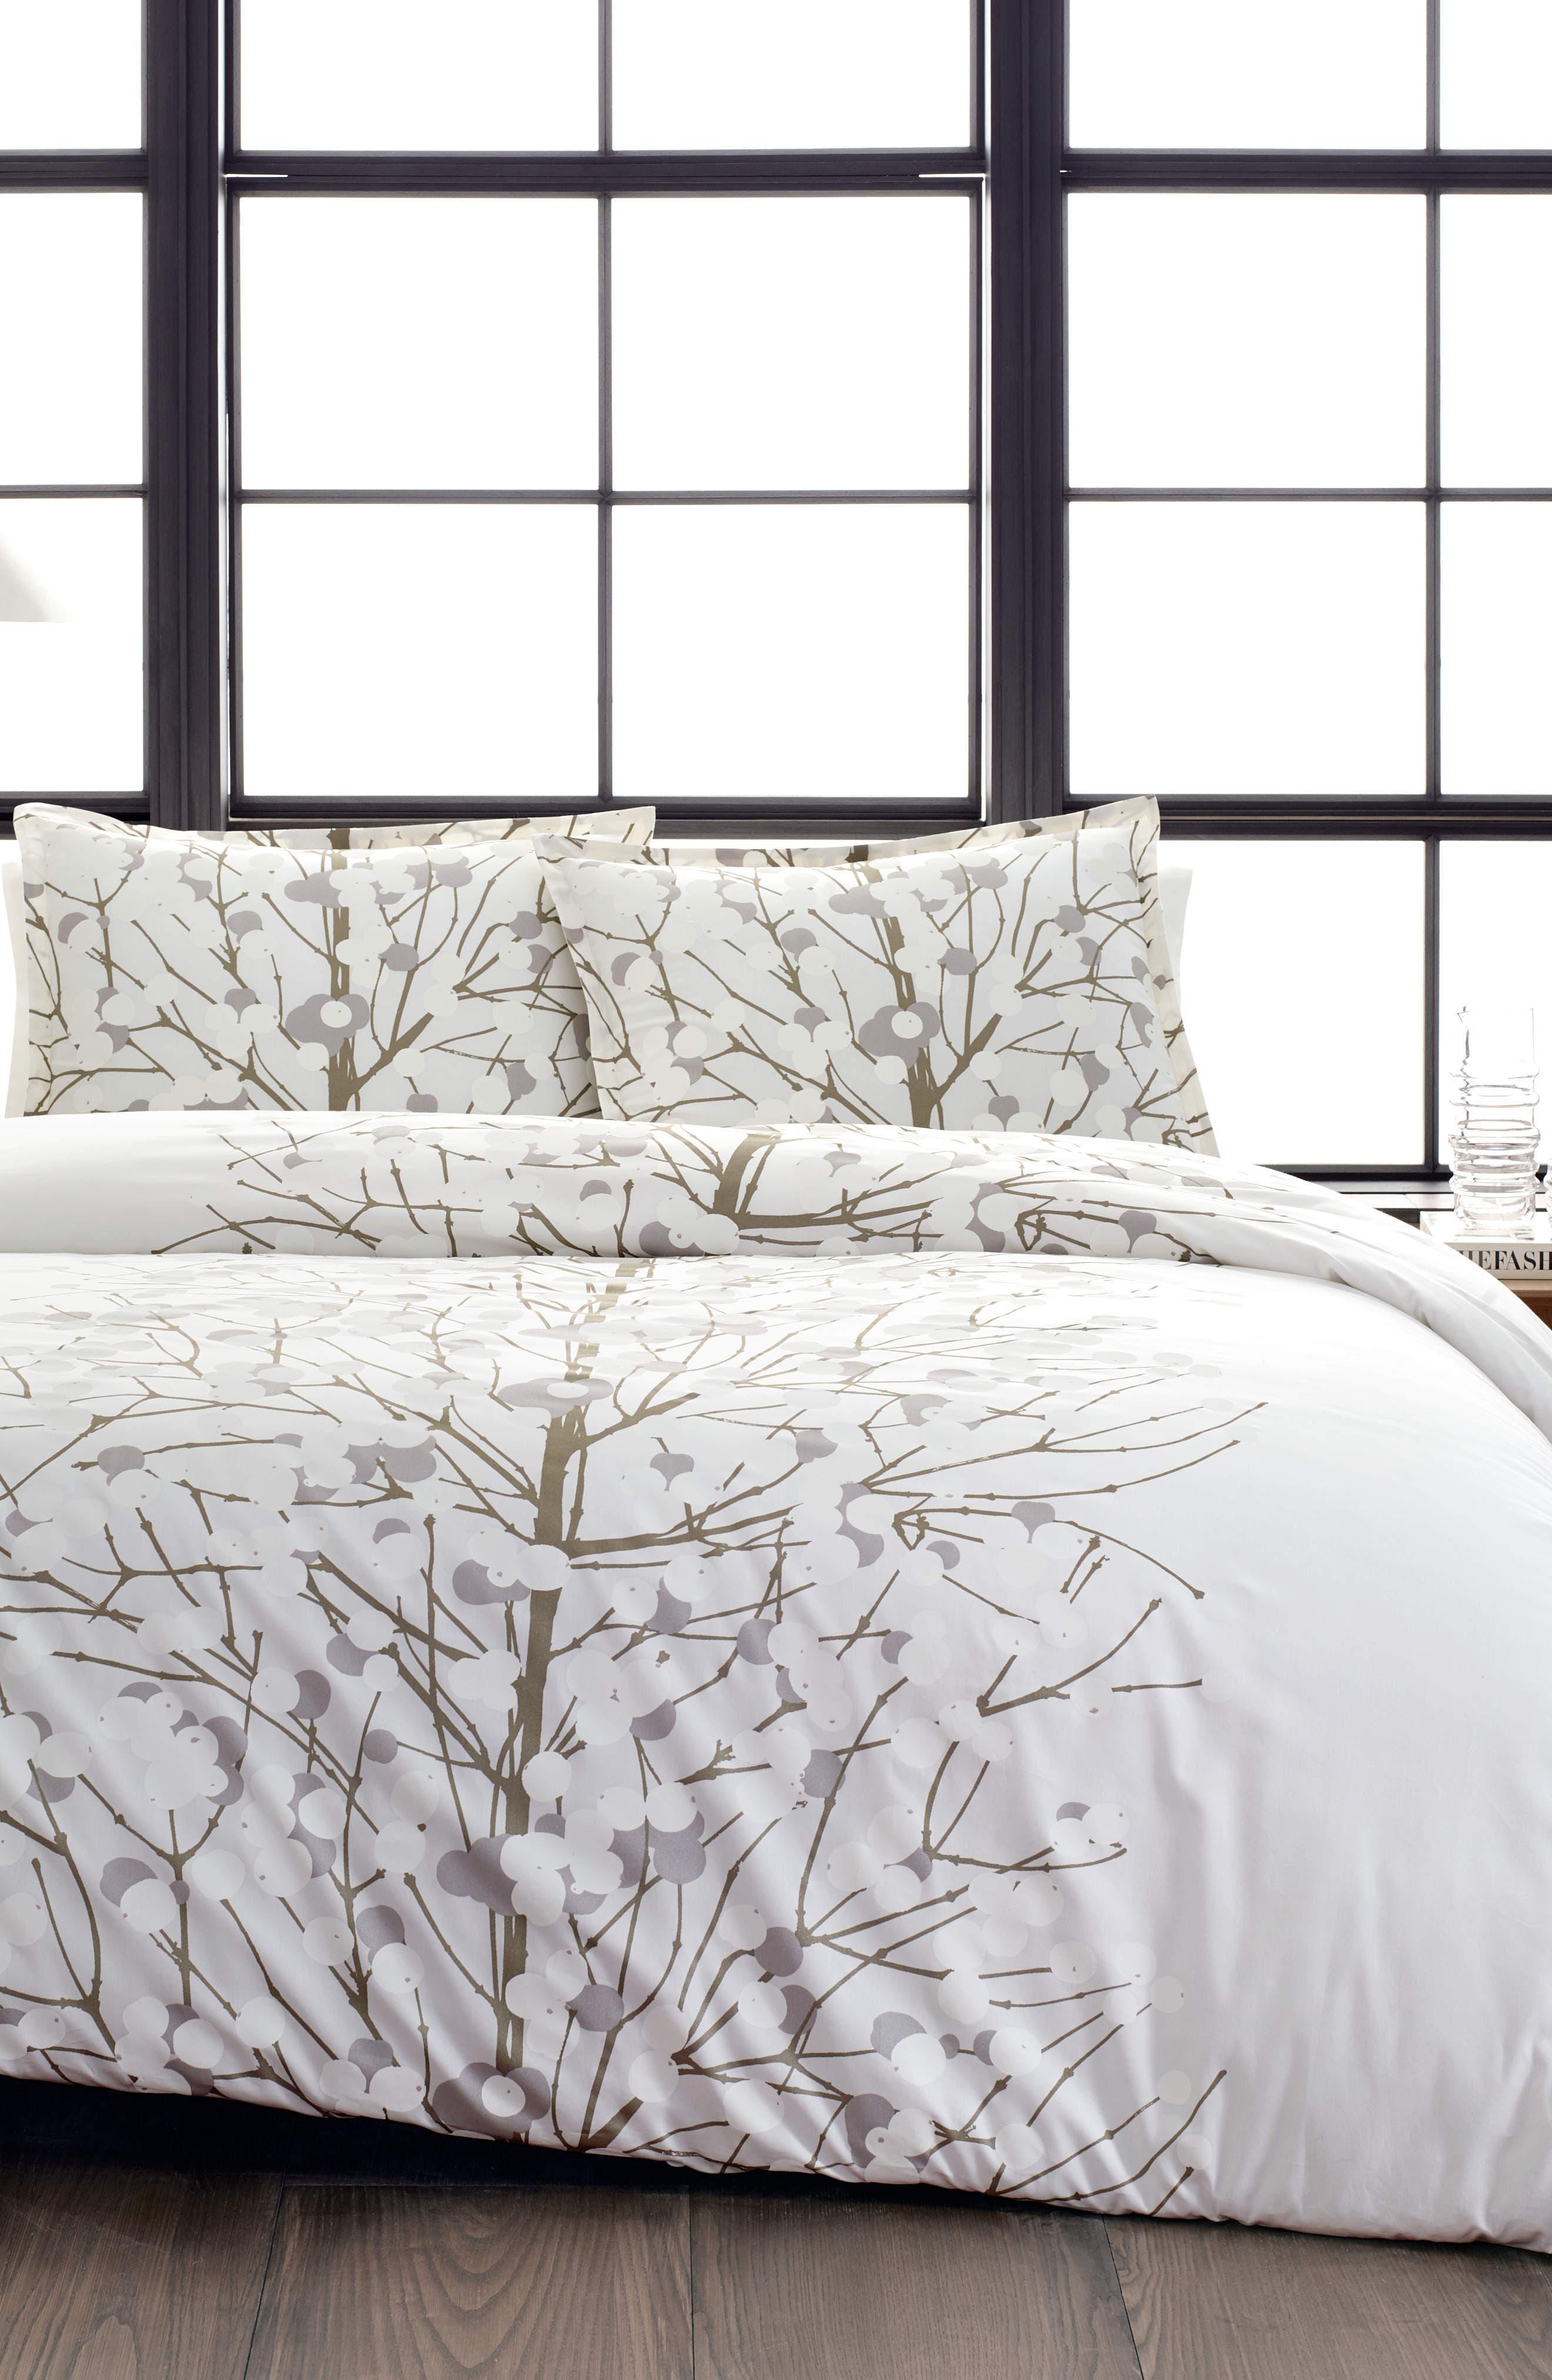 Lumimarja Silver Comforter & Sham Set,                             Main thumbnail 1, color,                             MEDIUM GREY